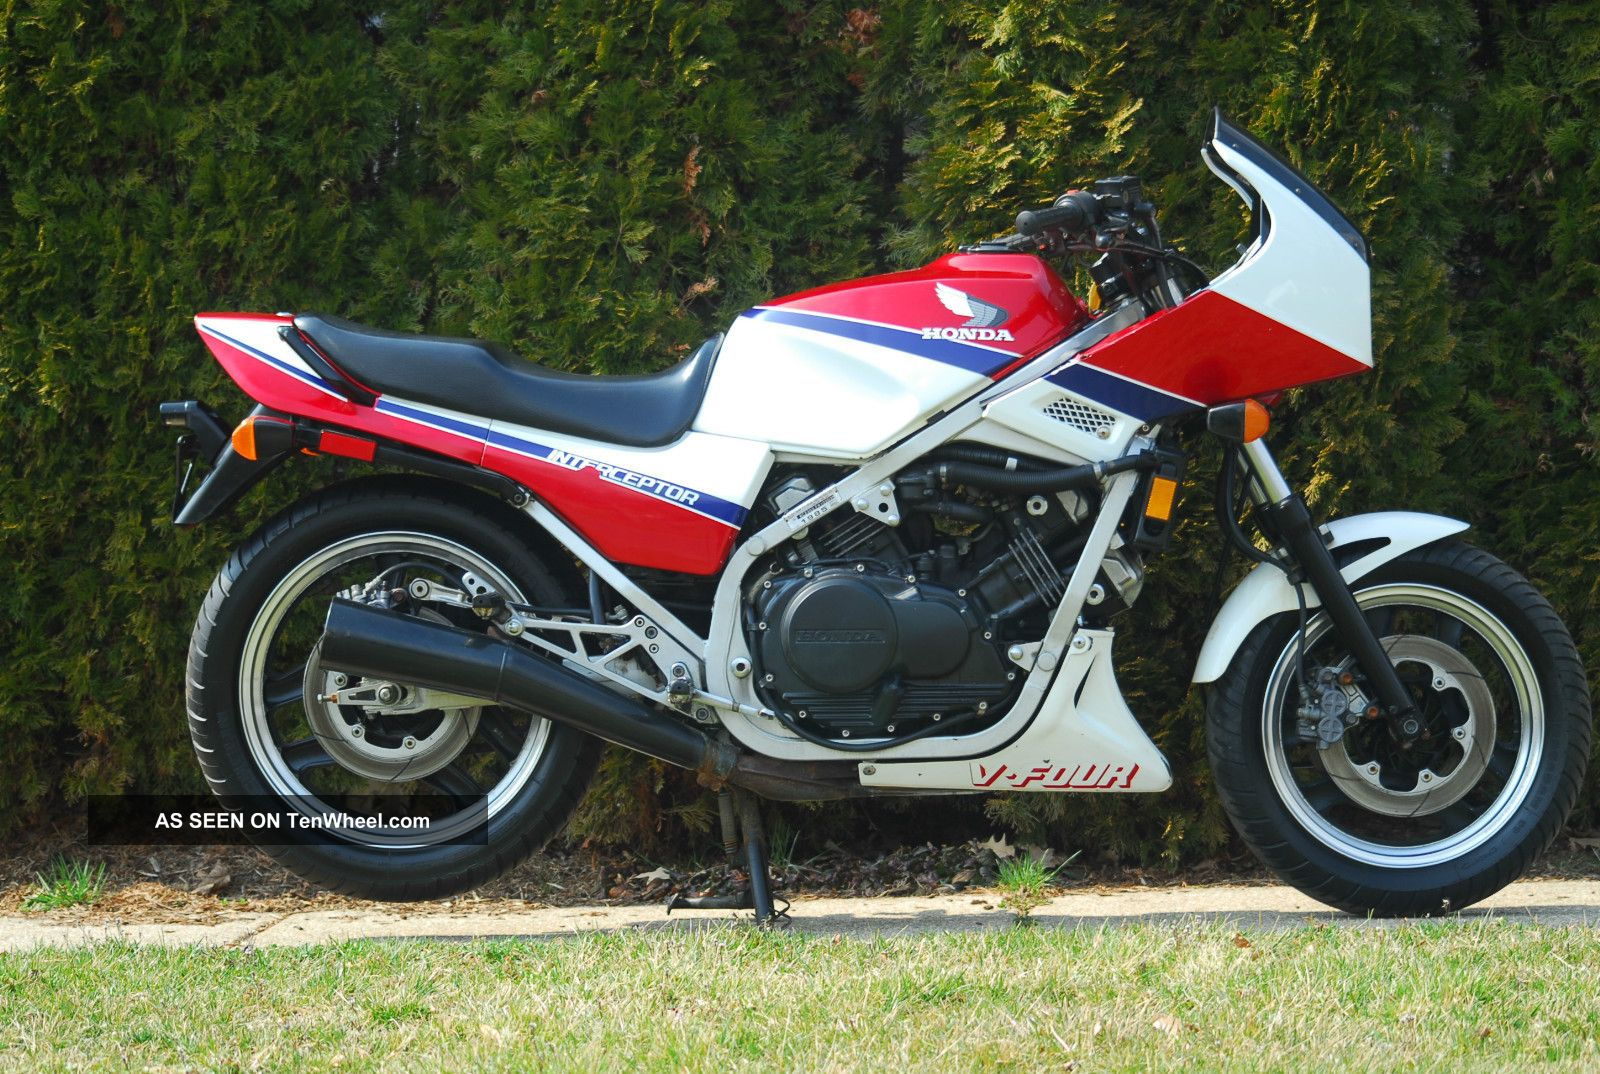 1985 honda interceptor vf700 700 750 video for 1987 yamaha vmax snowmobile for sale